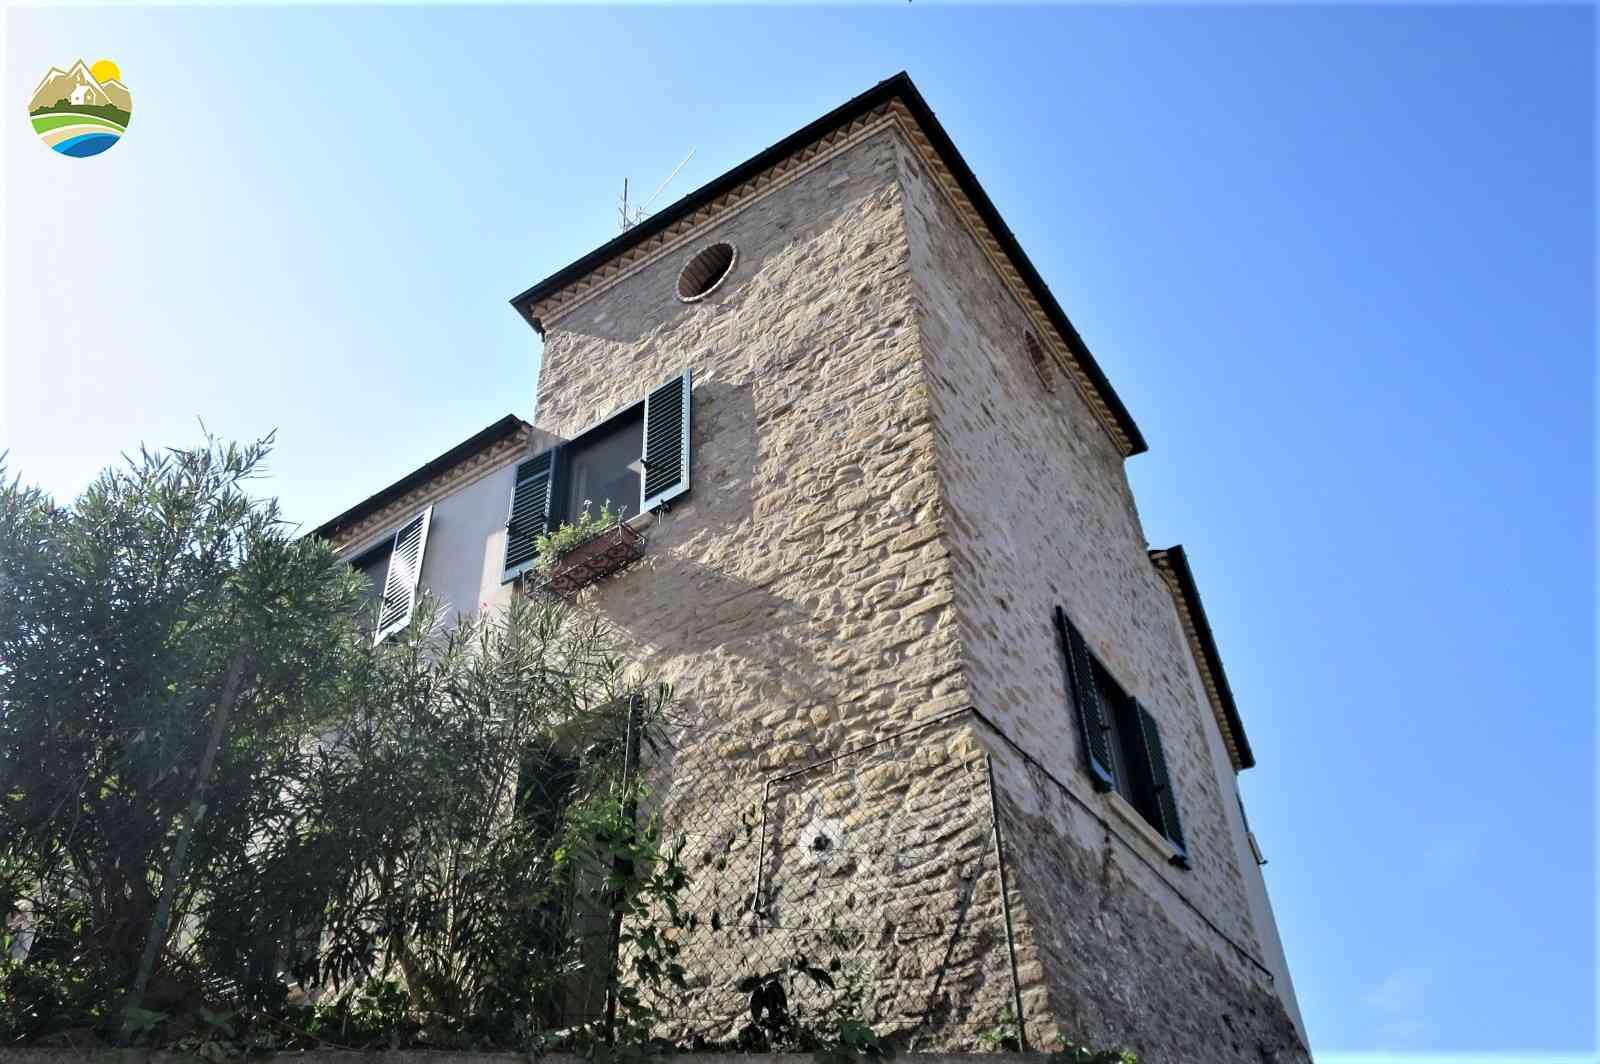 Casa singola La Vecchia Torre - Cellino Attanasio - EUR 255.344